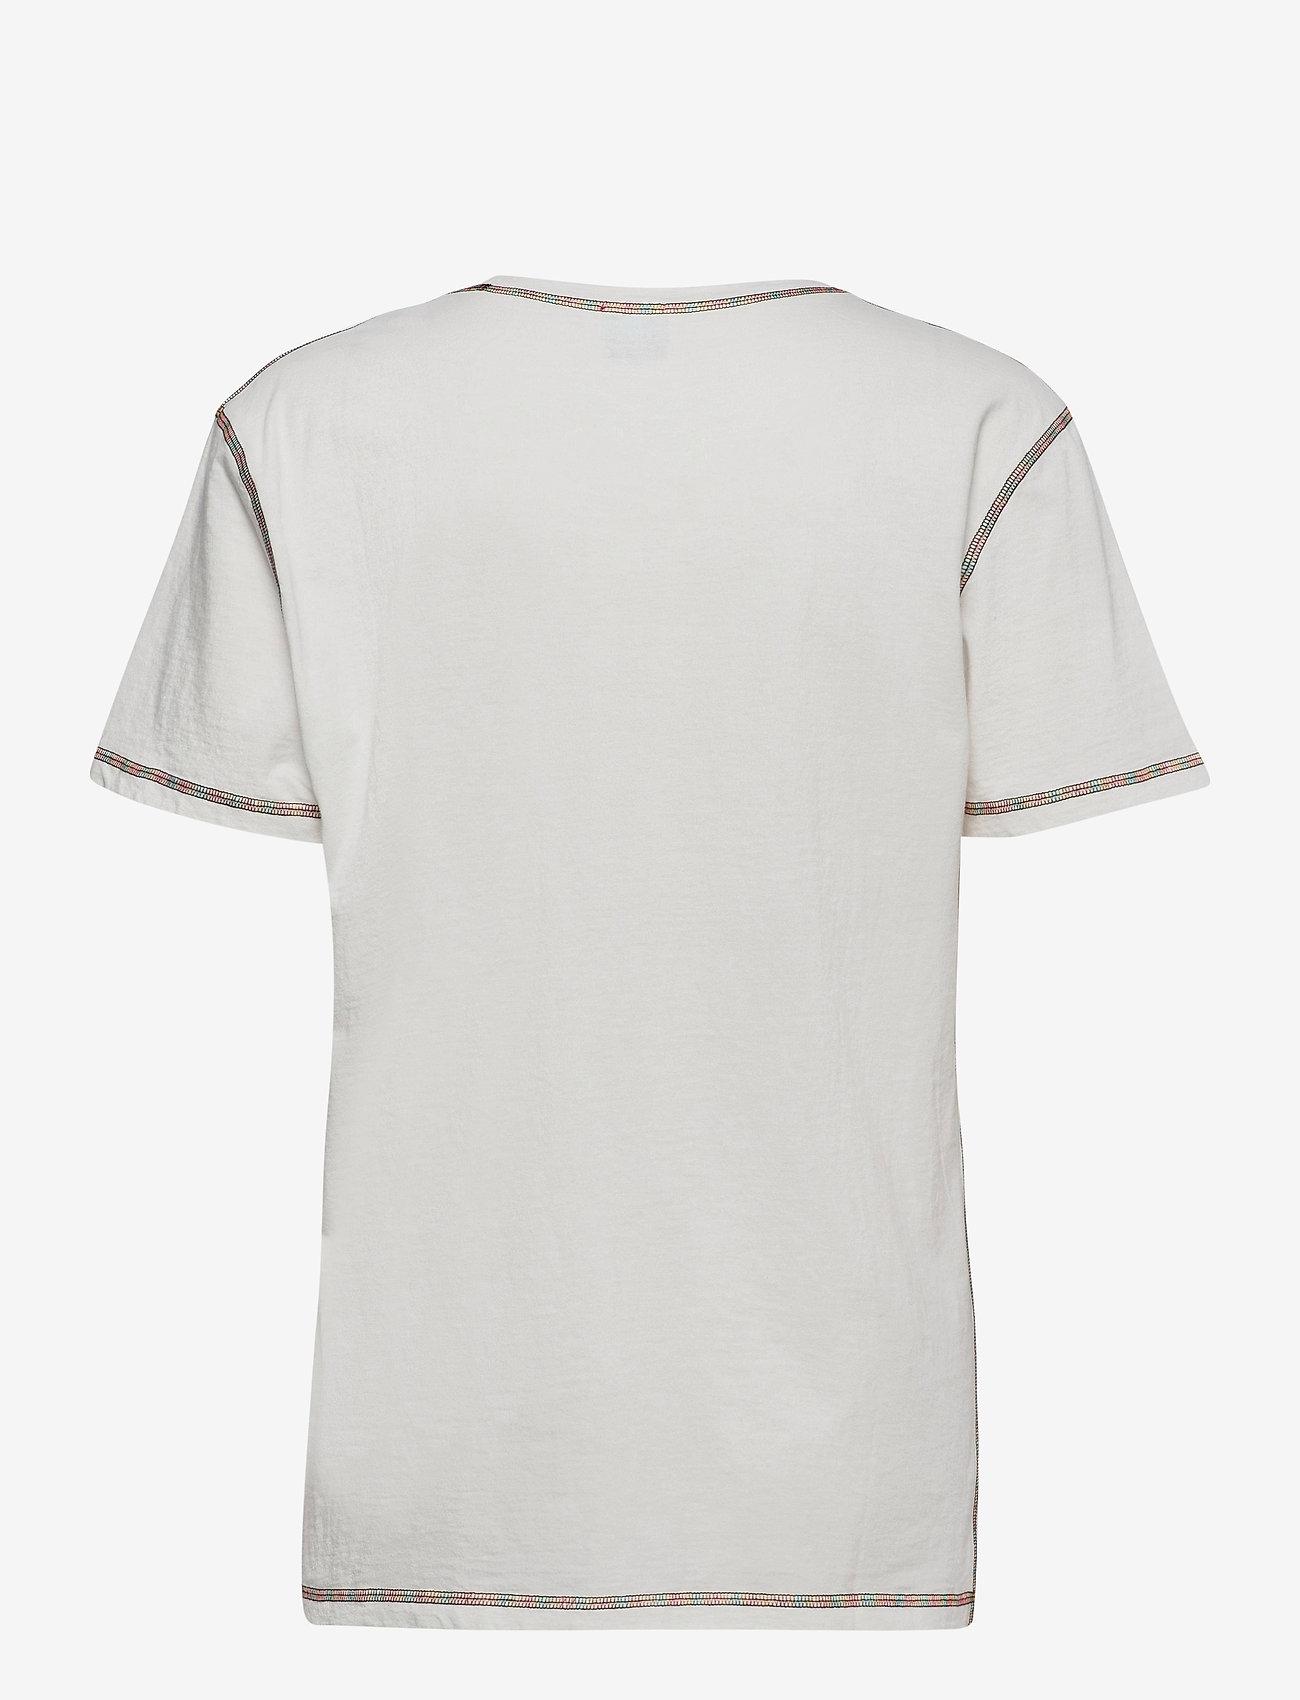 M Missoni - M MISSONI-SHORT SLEEVE T-SHIRT - t-shirts - marshmallow - 1